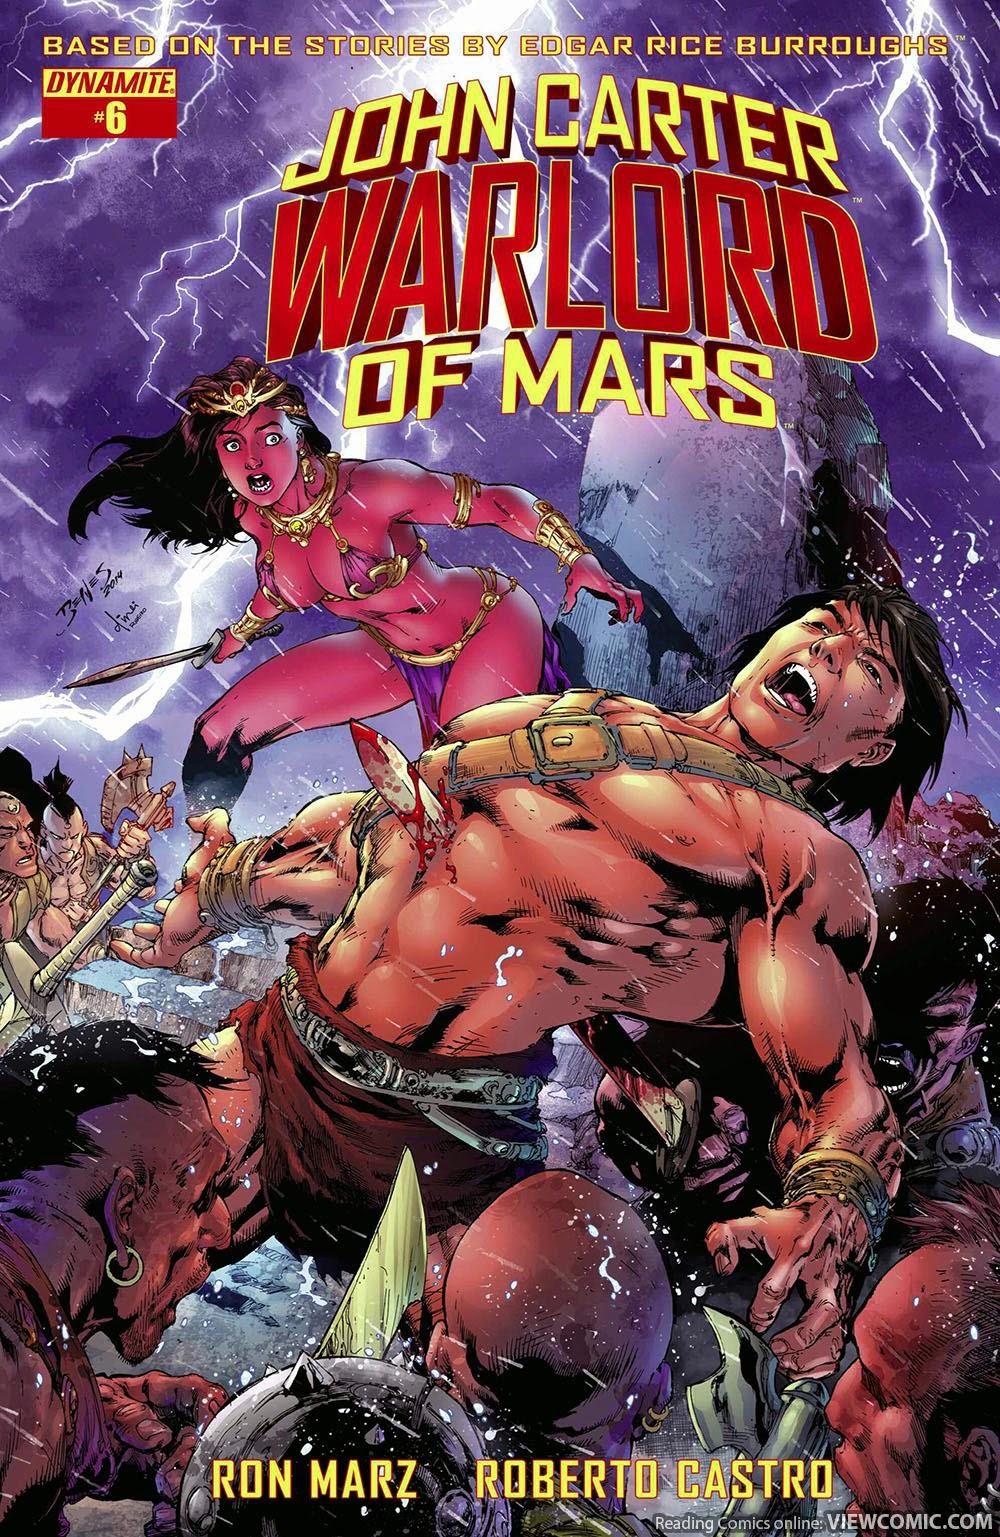 john carter warlord of mars | viewcomic reading comics online for